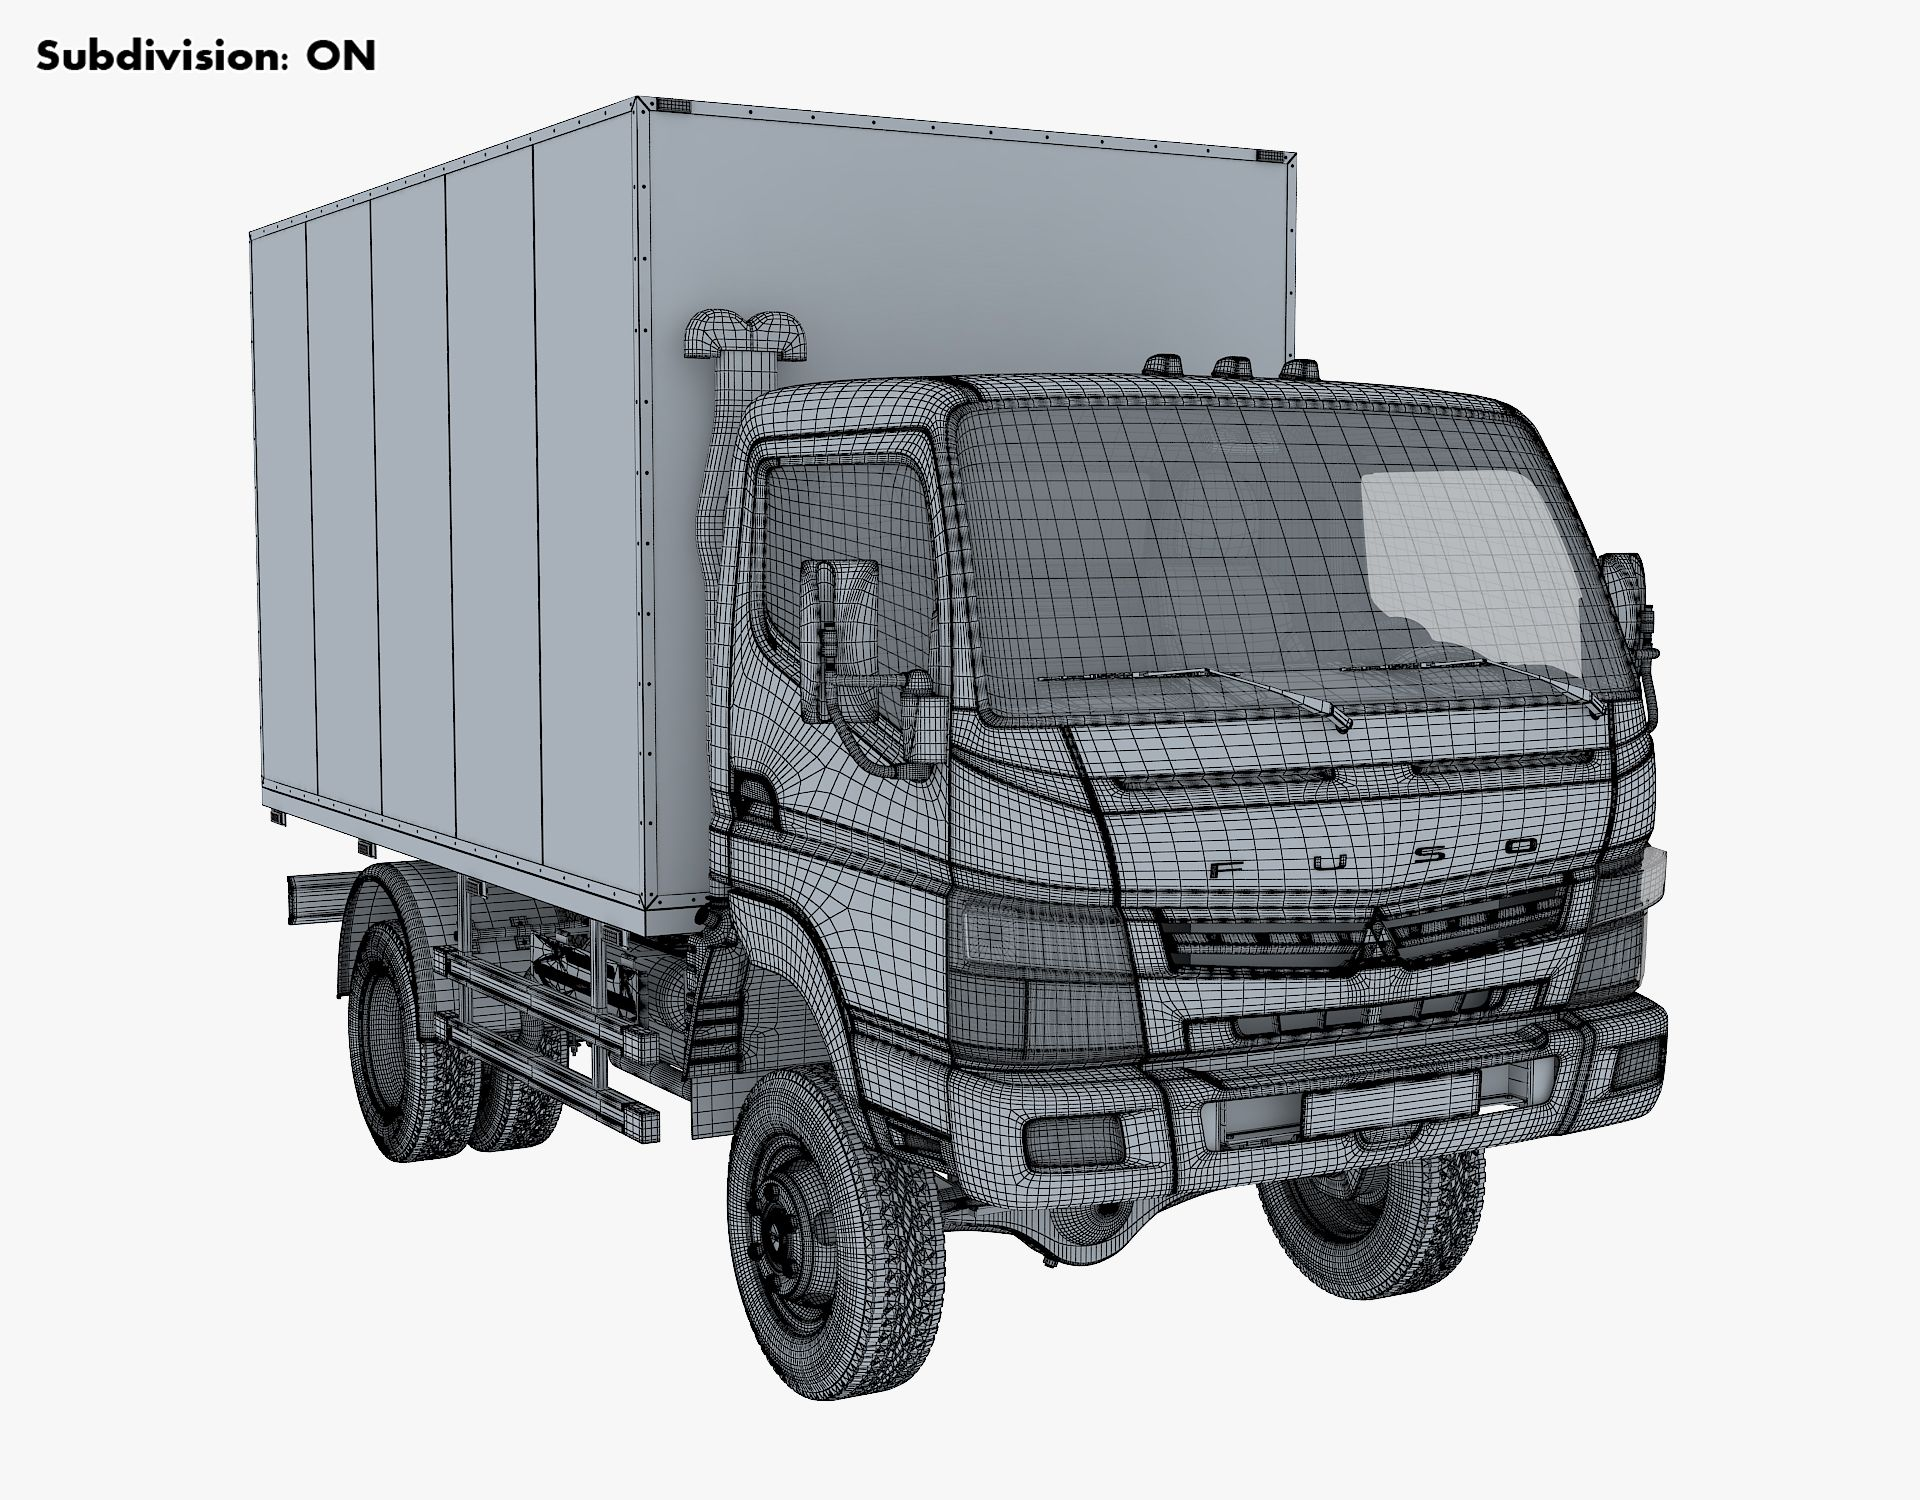 Mitsubishi Fuso Canter 4x4 Box Ad Fuso Mitsubishi Canter Box In 2020 Mitsubishi Canter 4x4